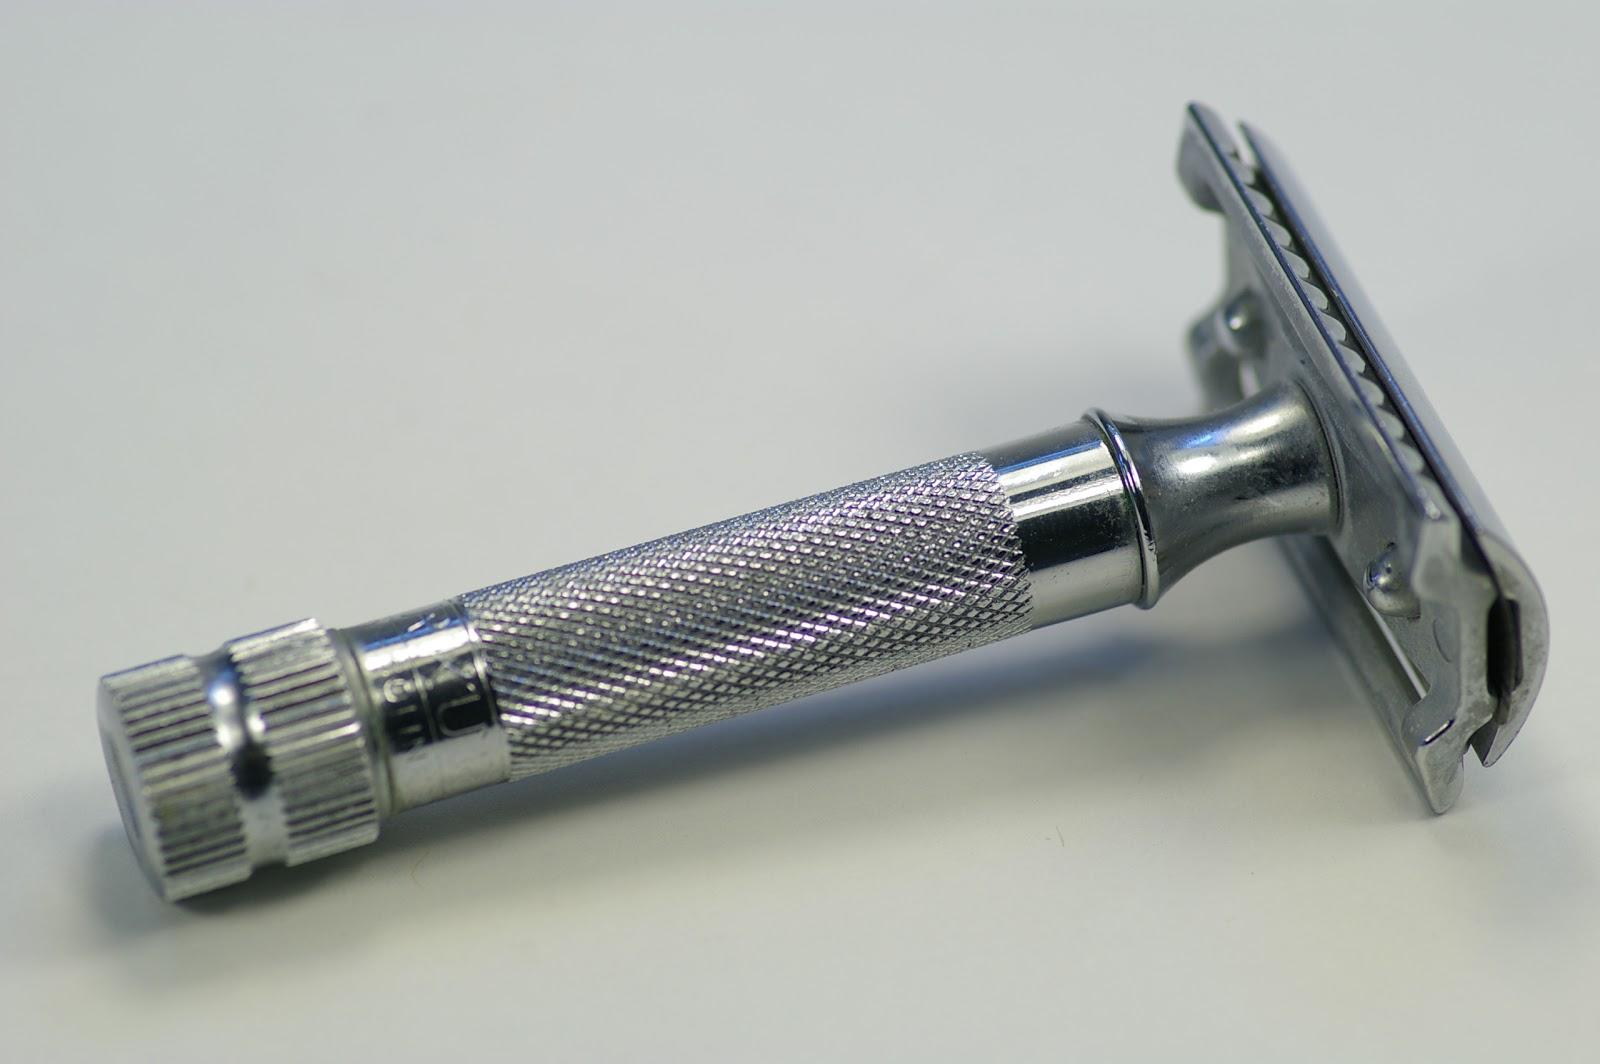 http://4.bp.blogspot.com/-qQs_bw5CmLY/TnPubwRIRyI/AAAAAAAAEjo/zhM7tR3aOjI/s1600/Cheap+safety+razor+1.jpg